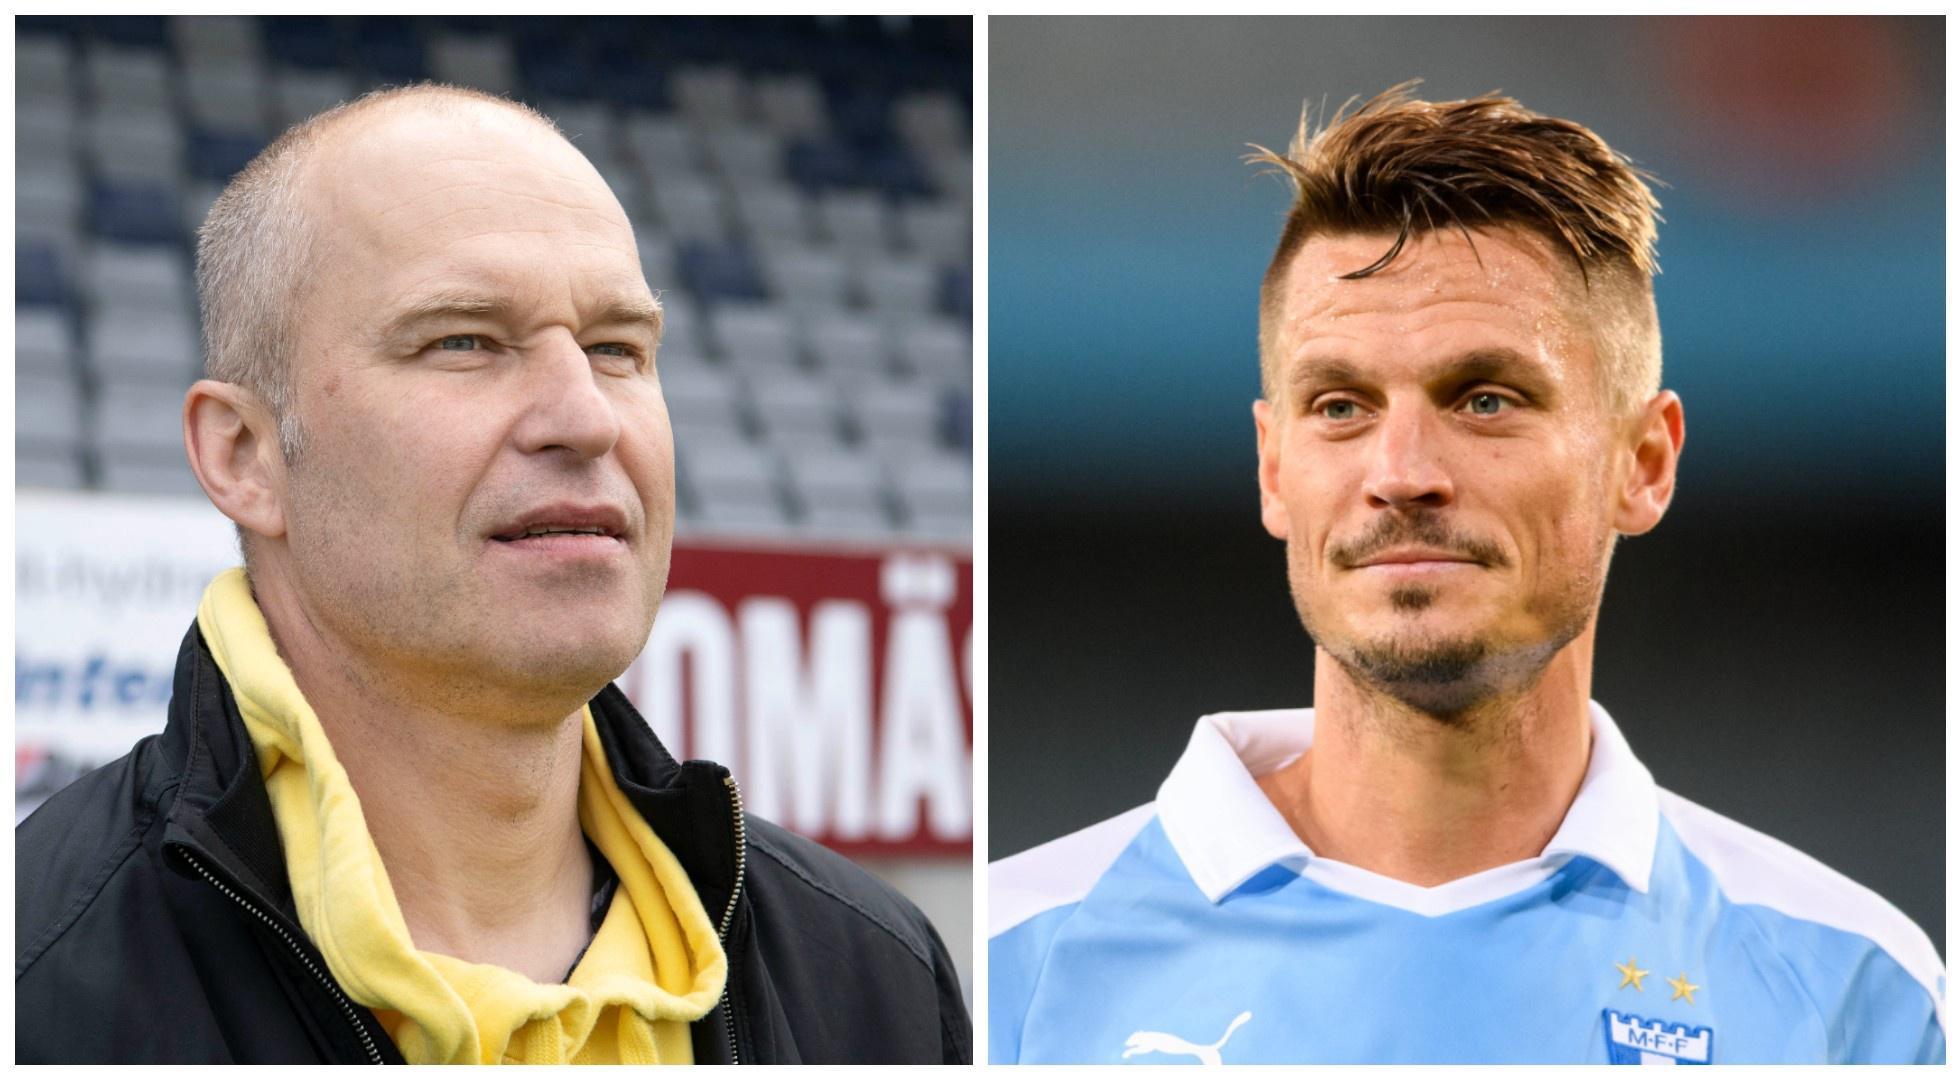 Rekord-Håkans krisråd till HBK: Ring Rosenberg